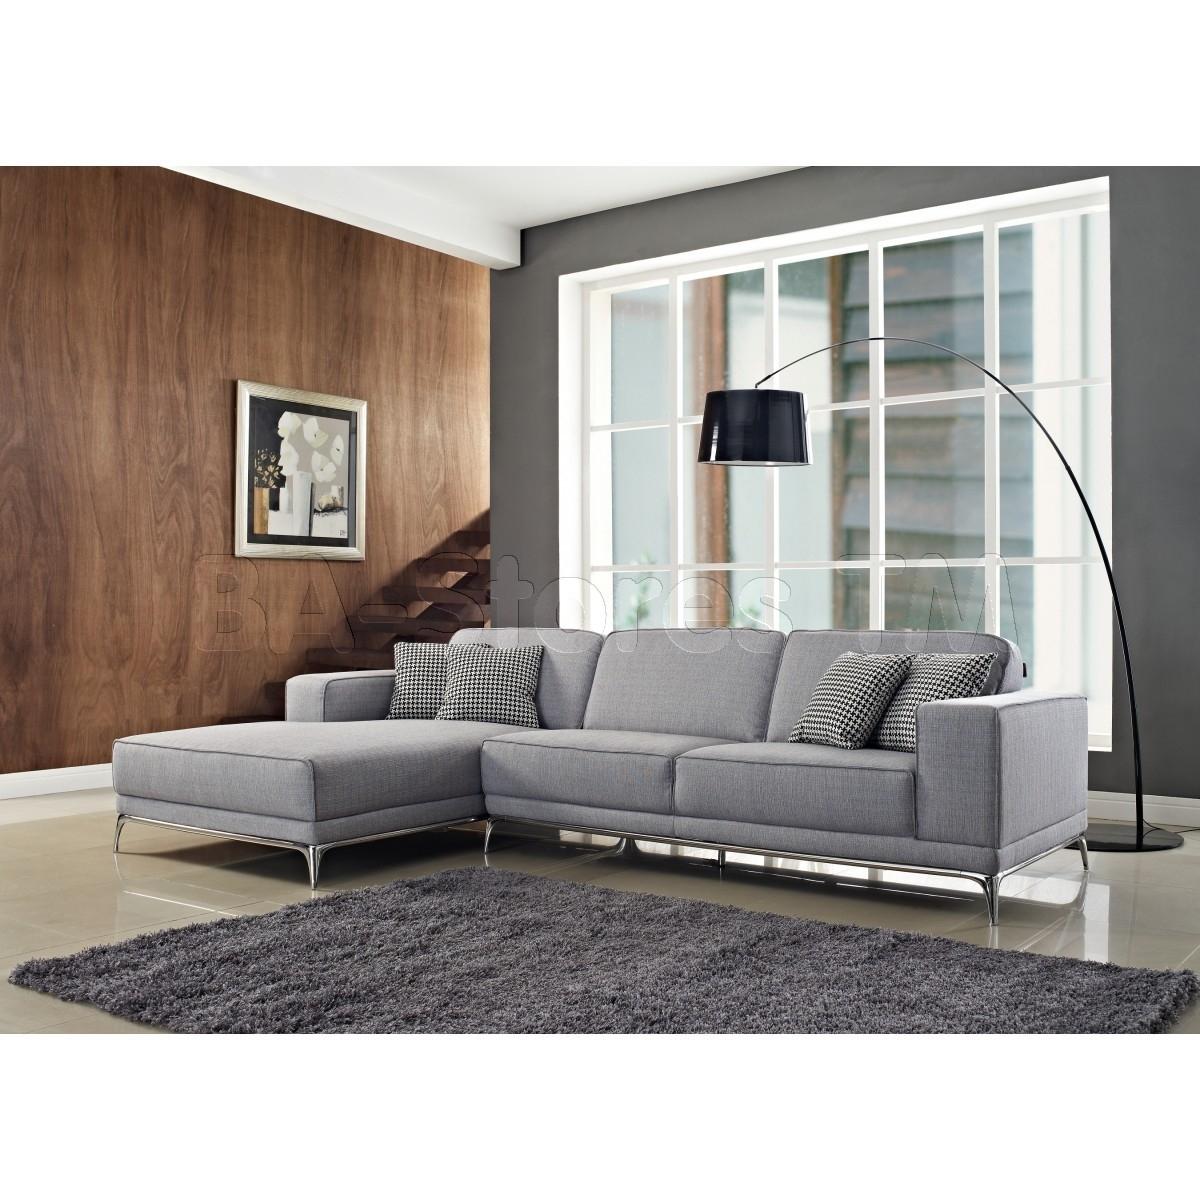 Agata Sectional Sofa | Light Grey – $2, (Image 1 of 10)